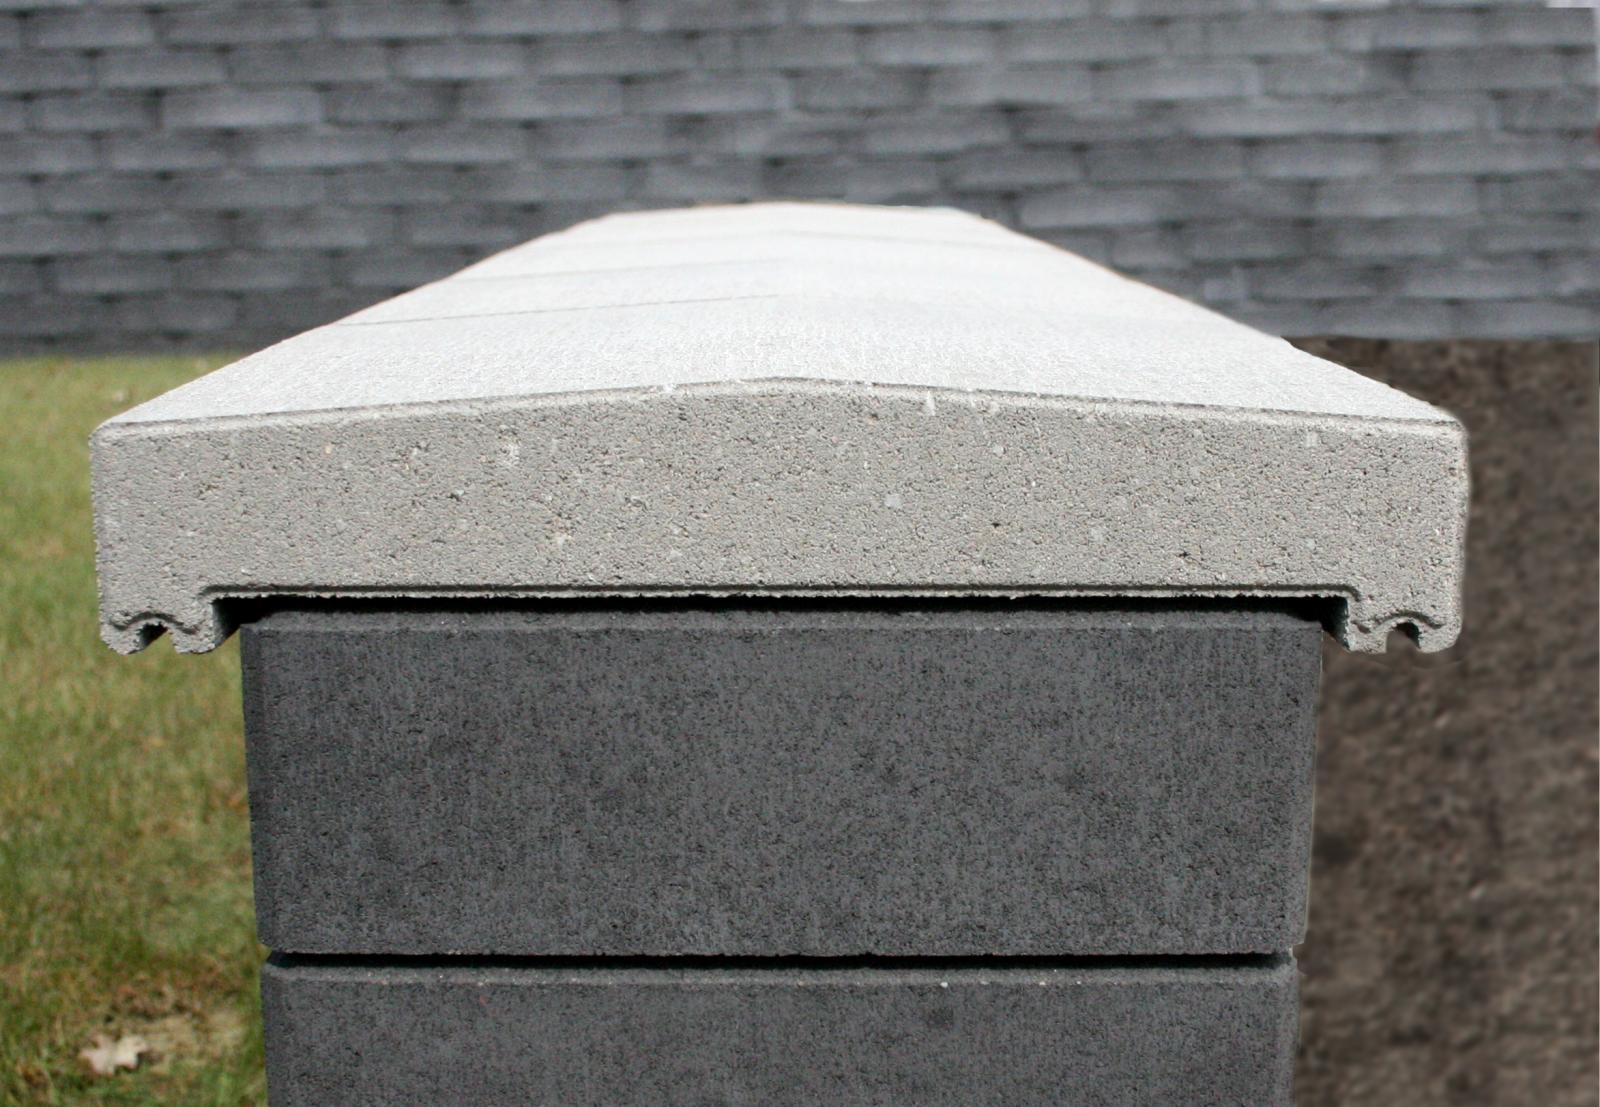 mauerabdeckungen christoph betonwaren. Black Bedroom Furniture Sets. Home Design Ideas